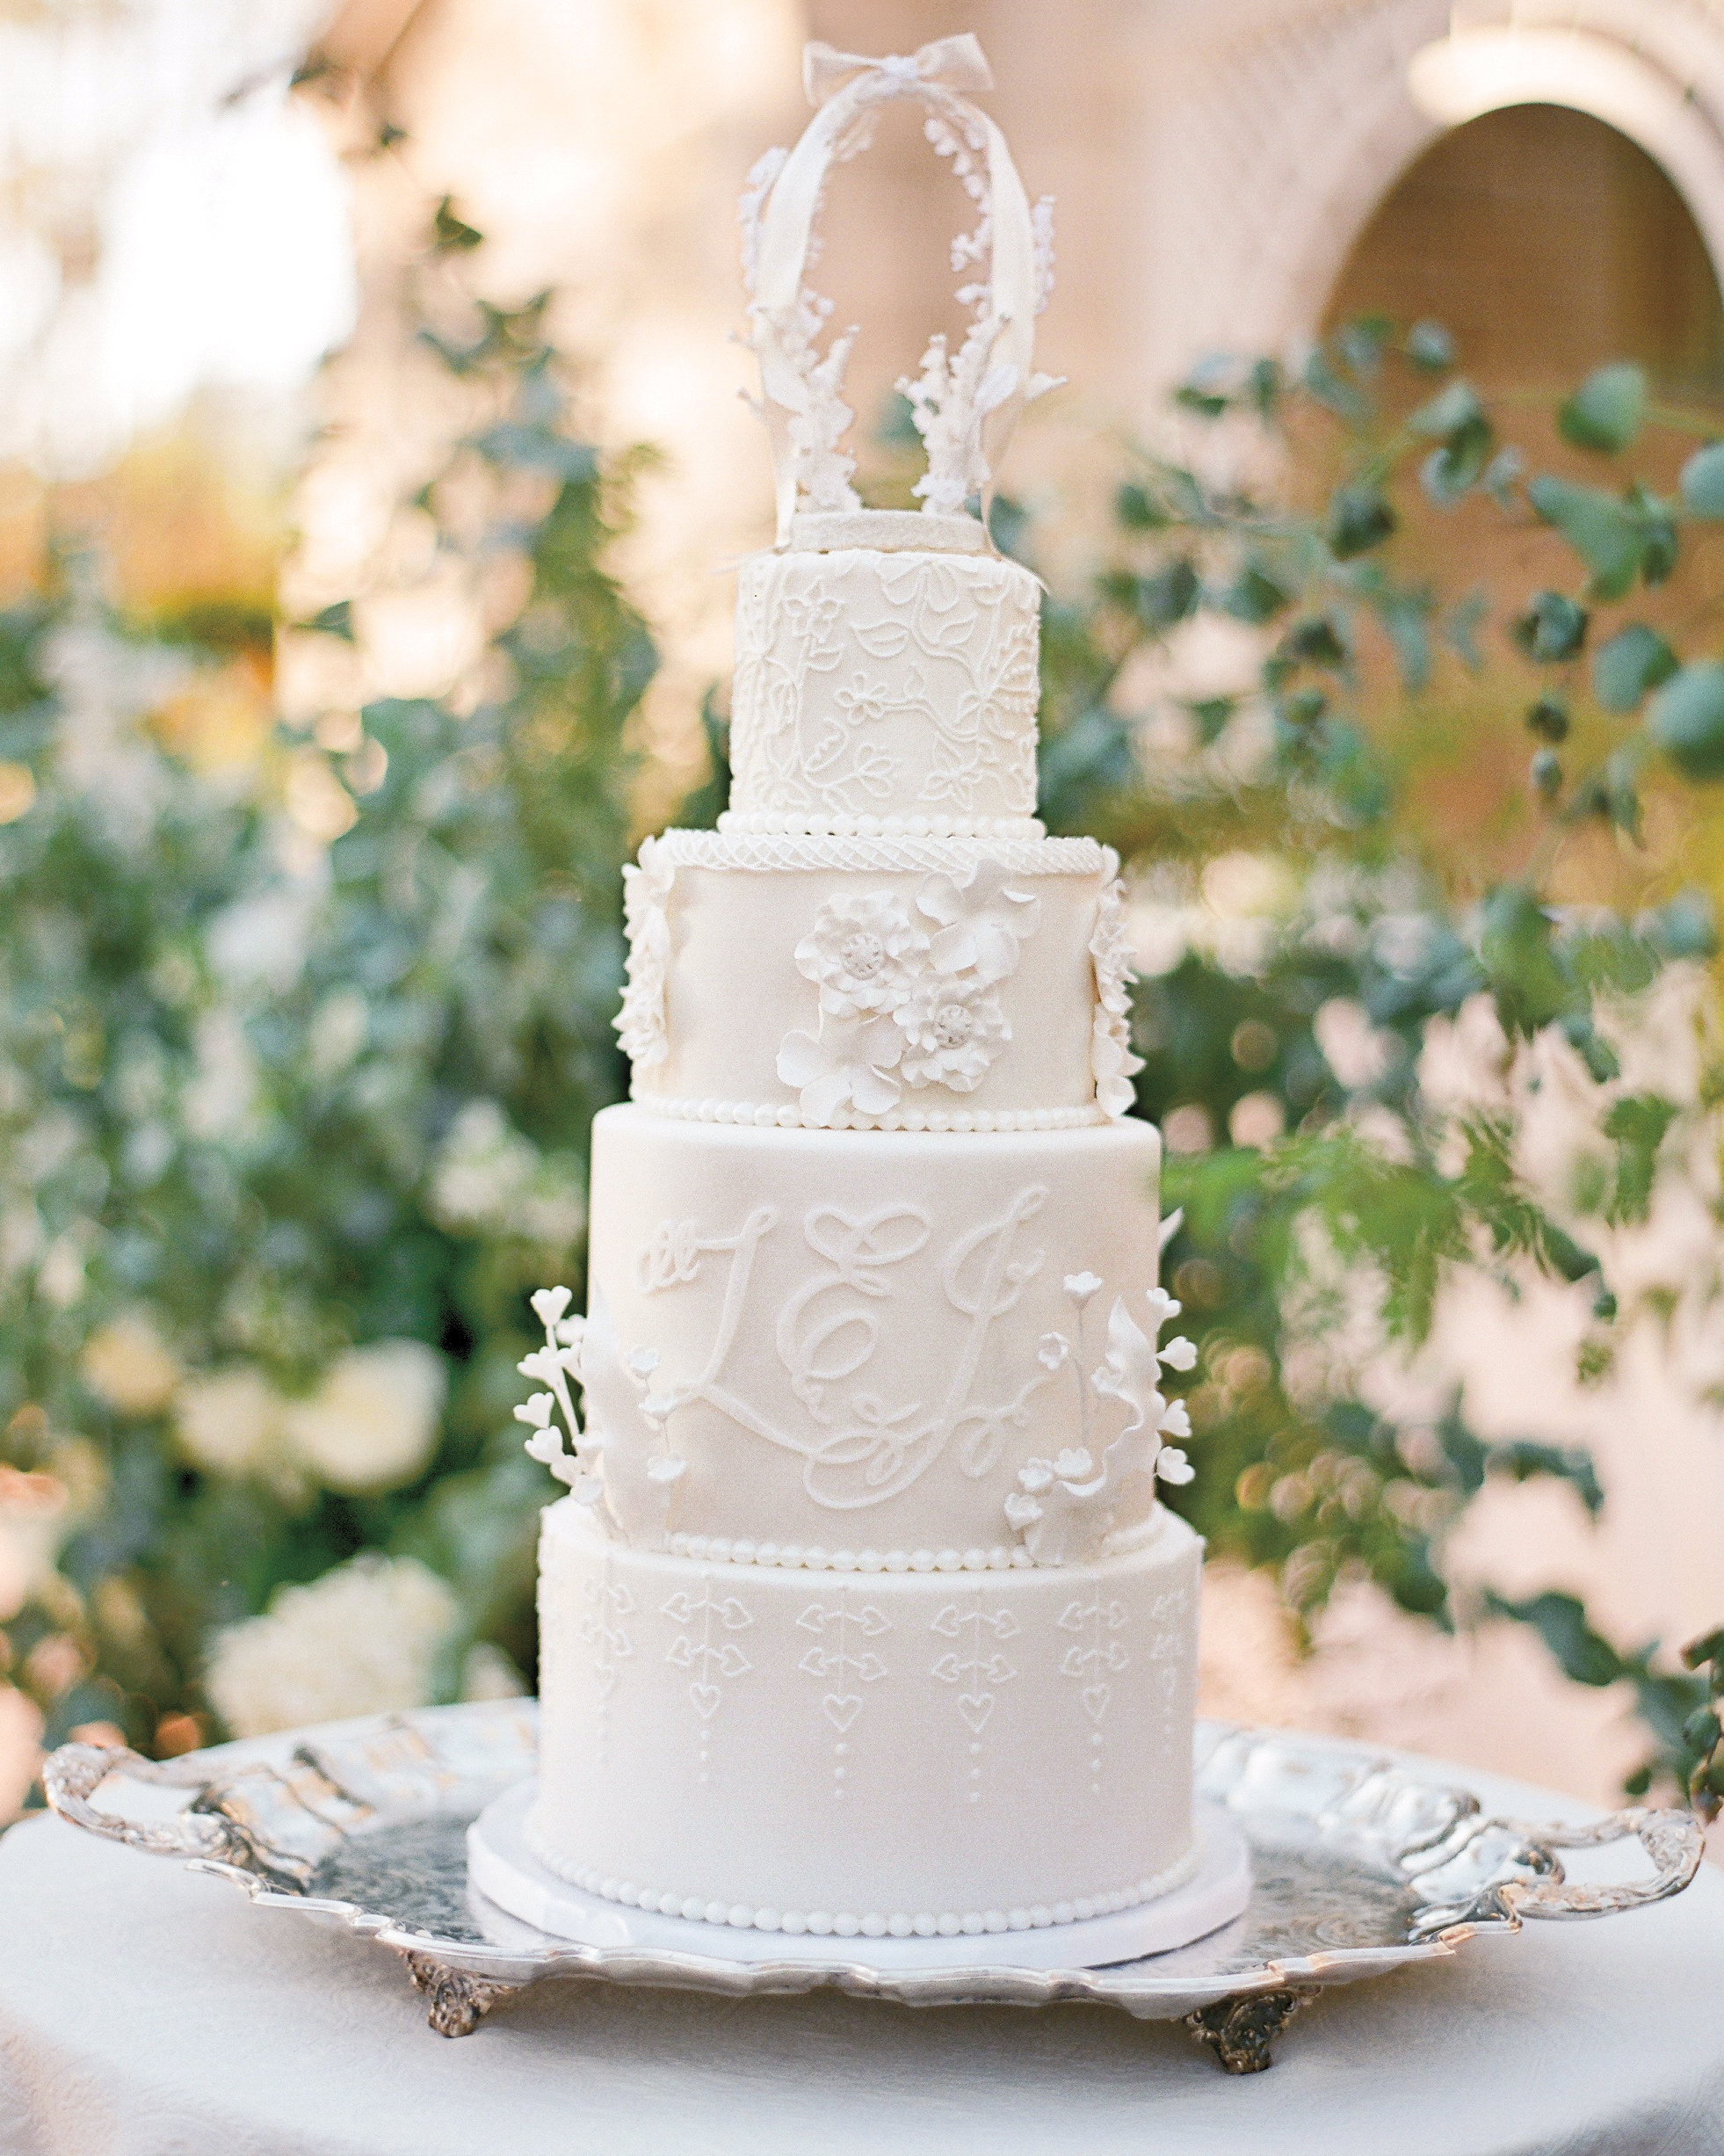 lily-jonathan-wedding-california-65650009-s112482.jpg